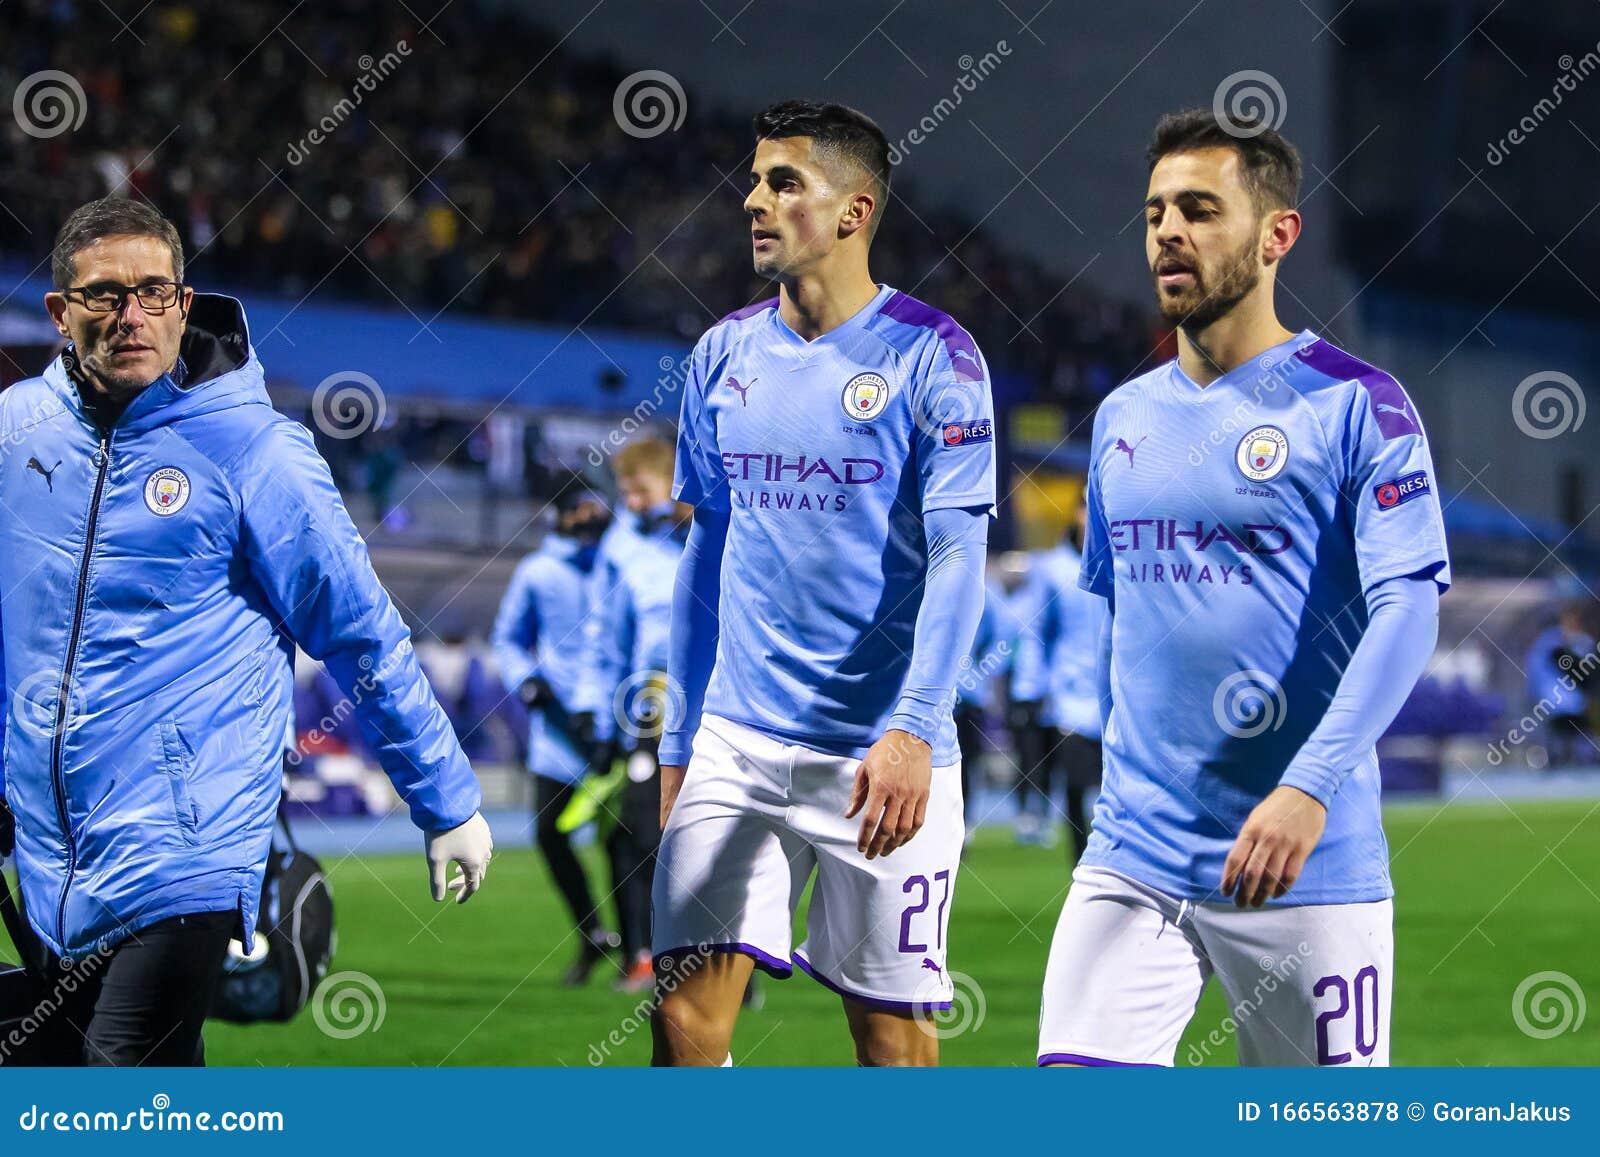 Dinamo Zagreb Vs Manchester City Editorial Stock Photo Image Of Grass League 166564053